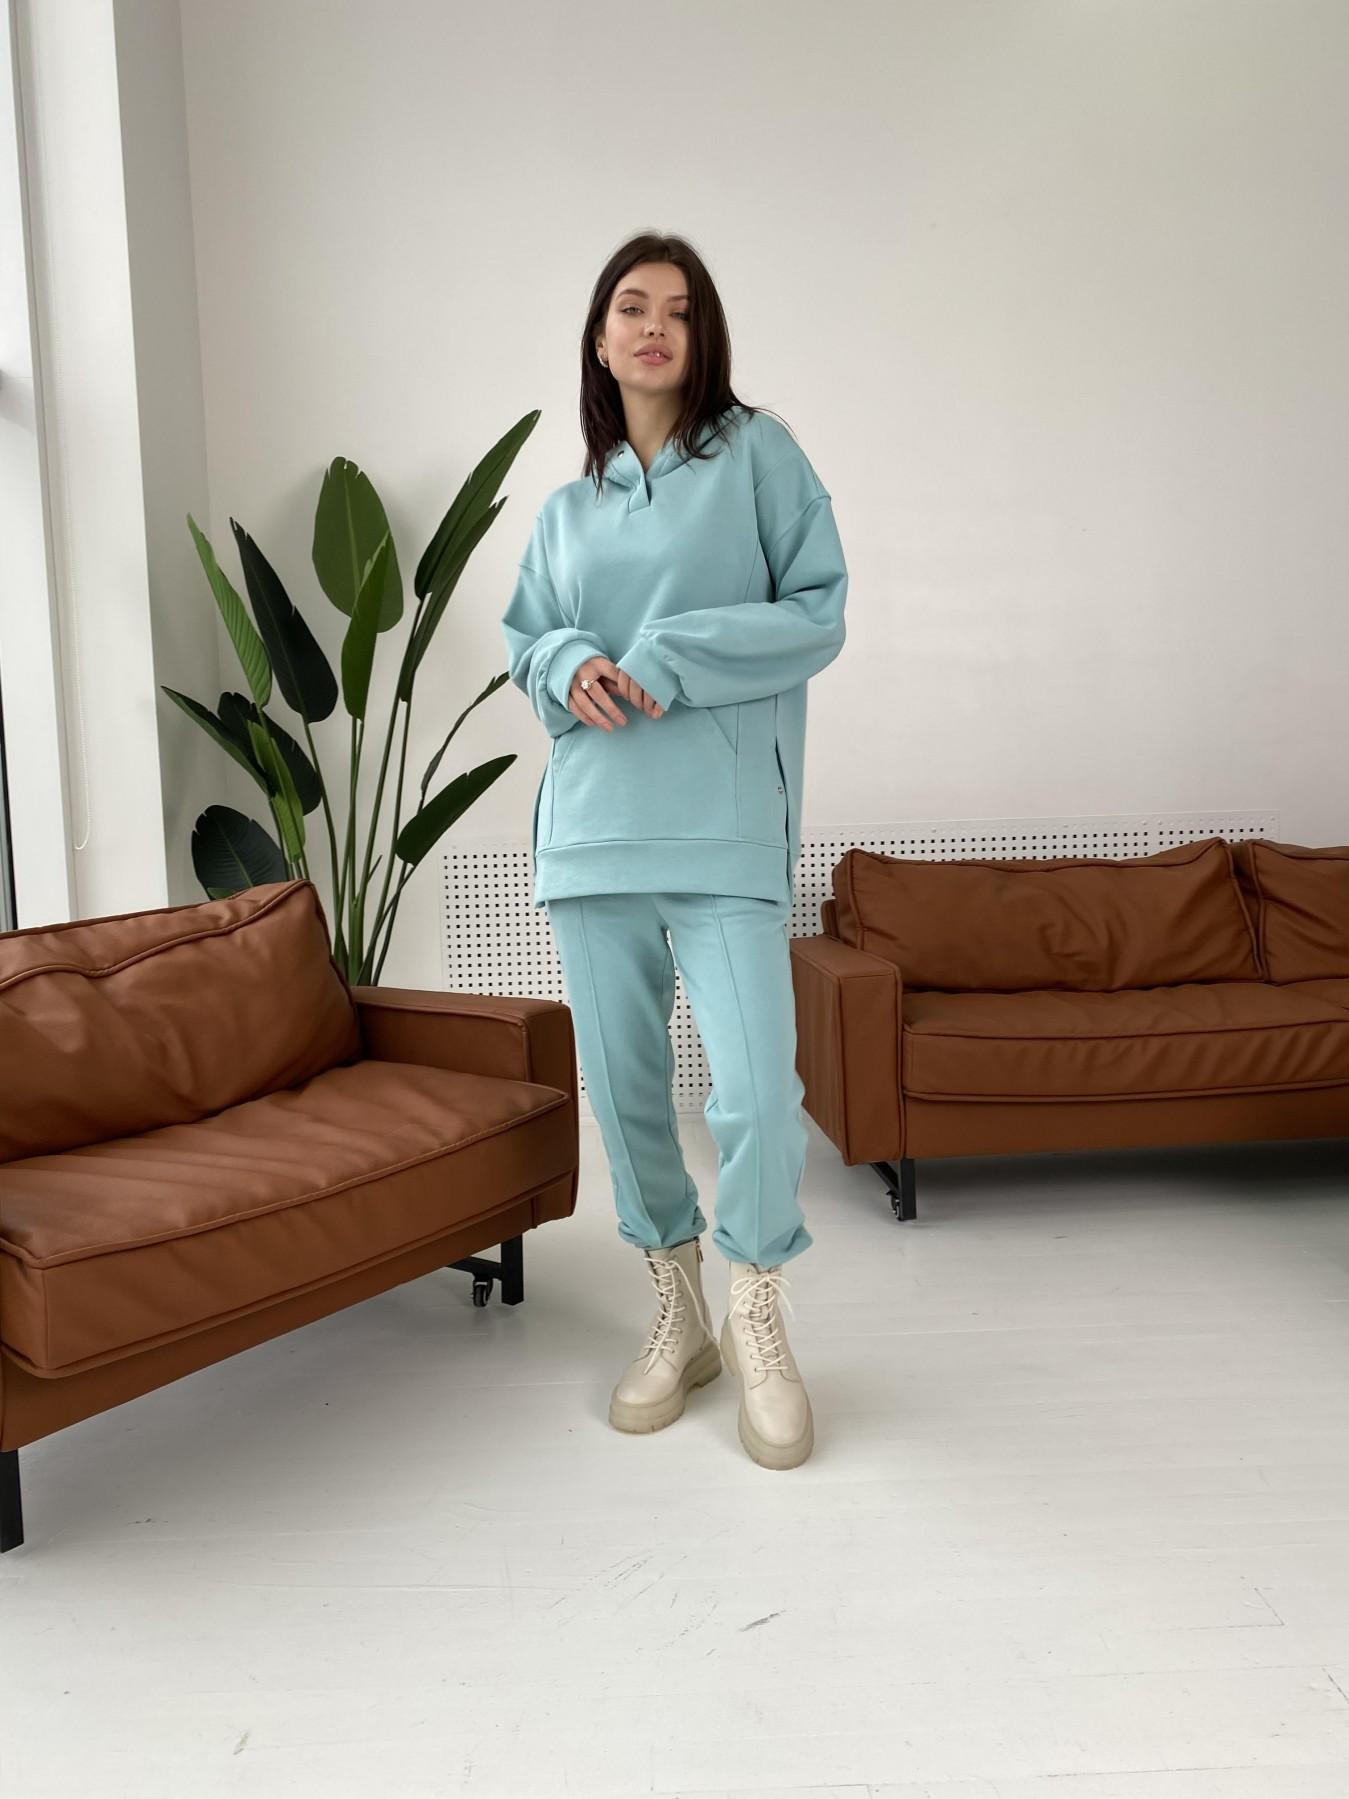 Лайф костюм  из 3х нитки 10782 АРТ. 47205 Цвет: Олива - фото 4, интернет магазин tm-modus.ru